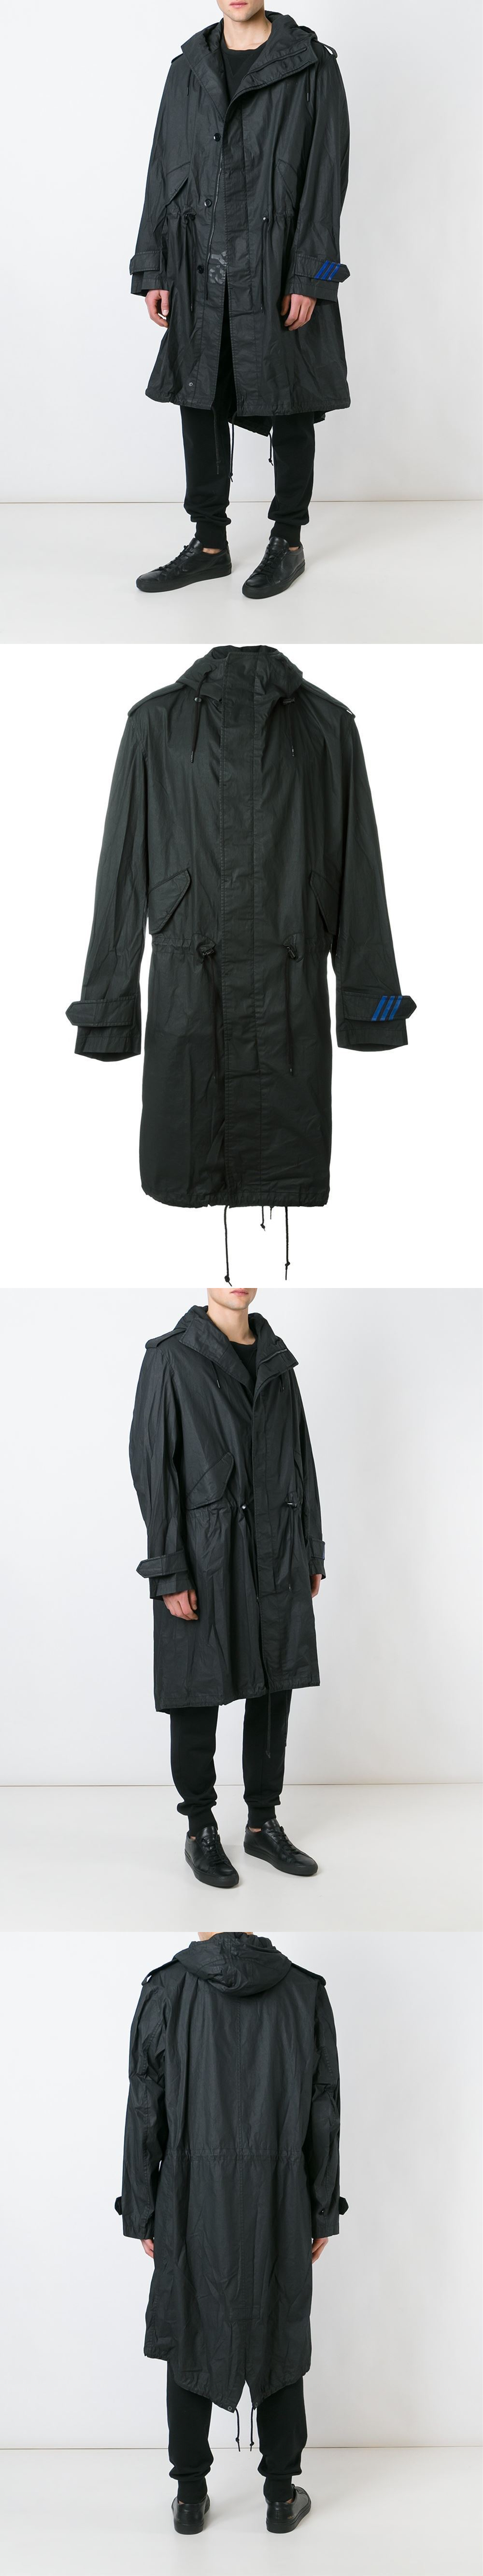 202e59d2d65c3 Outerwear Coats and Jackets 175771  Y-3 Yohji Yamamoto M Fishtail Prka  Ap2374 Mens